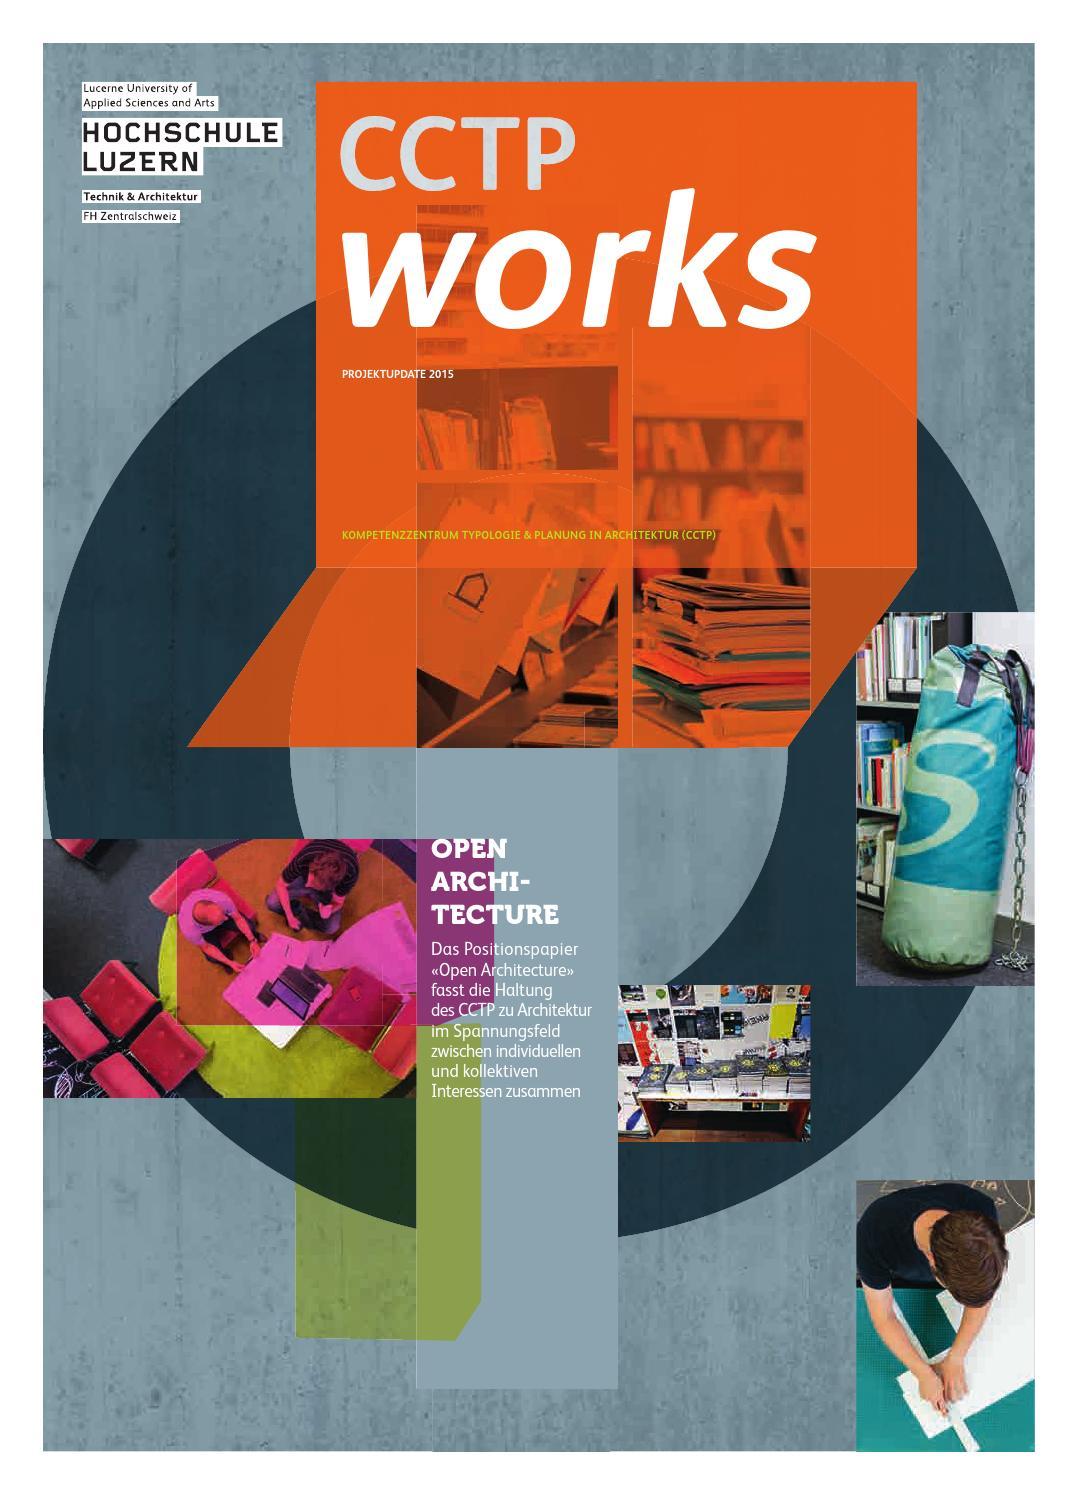 Cctp works 02 2016 by hochschule luzern issuu for Cctp architecte